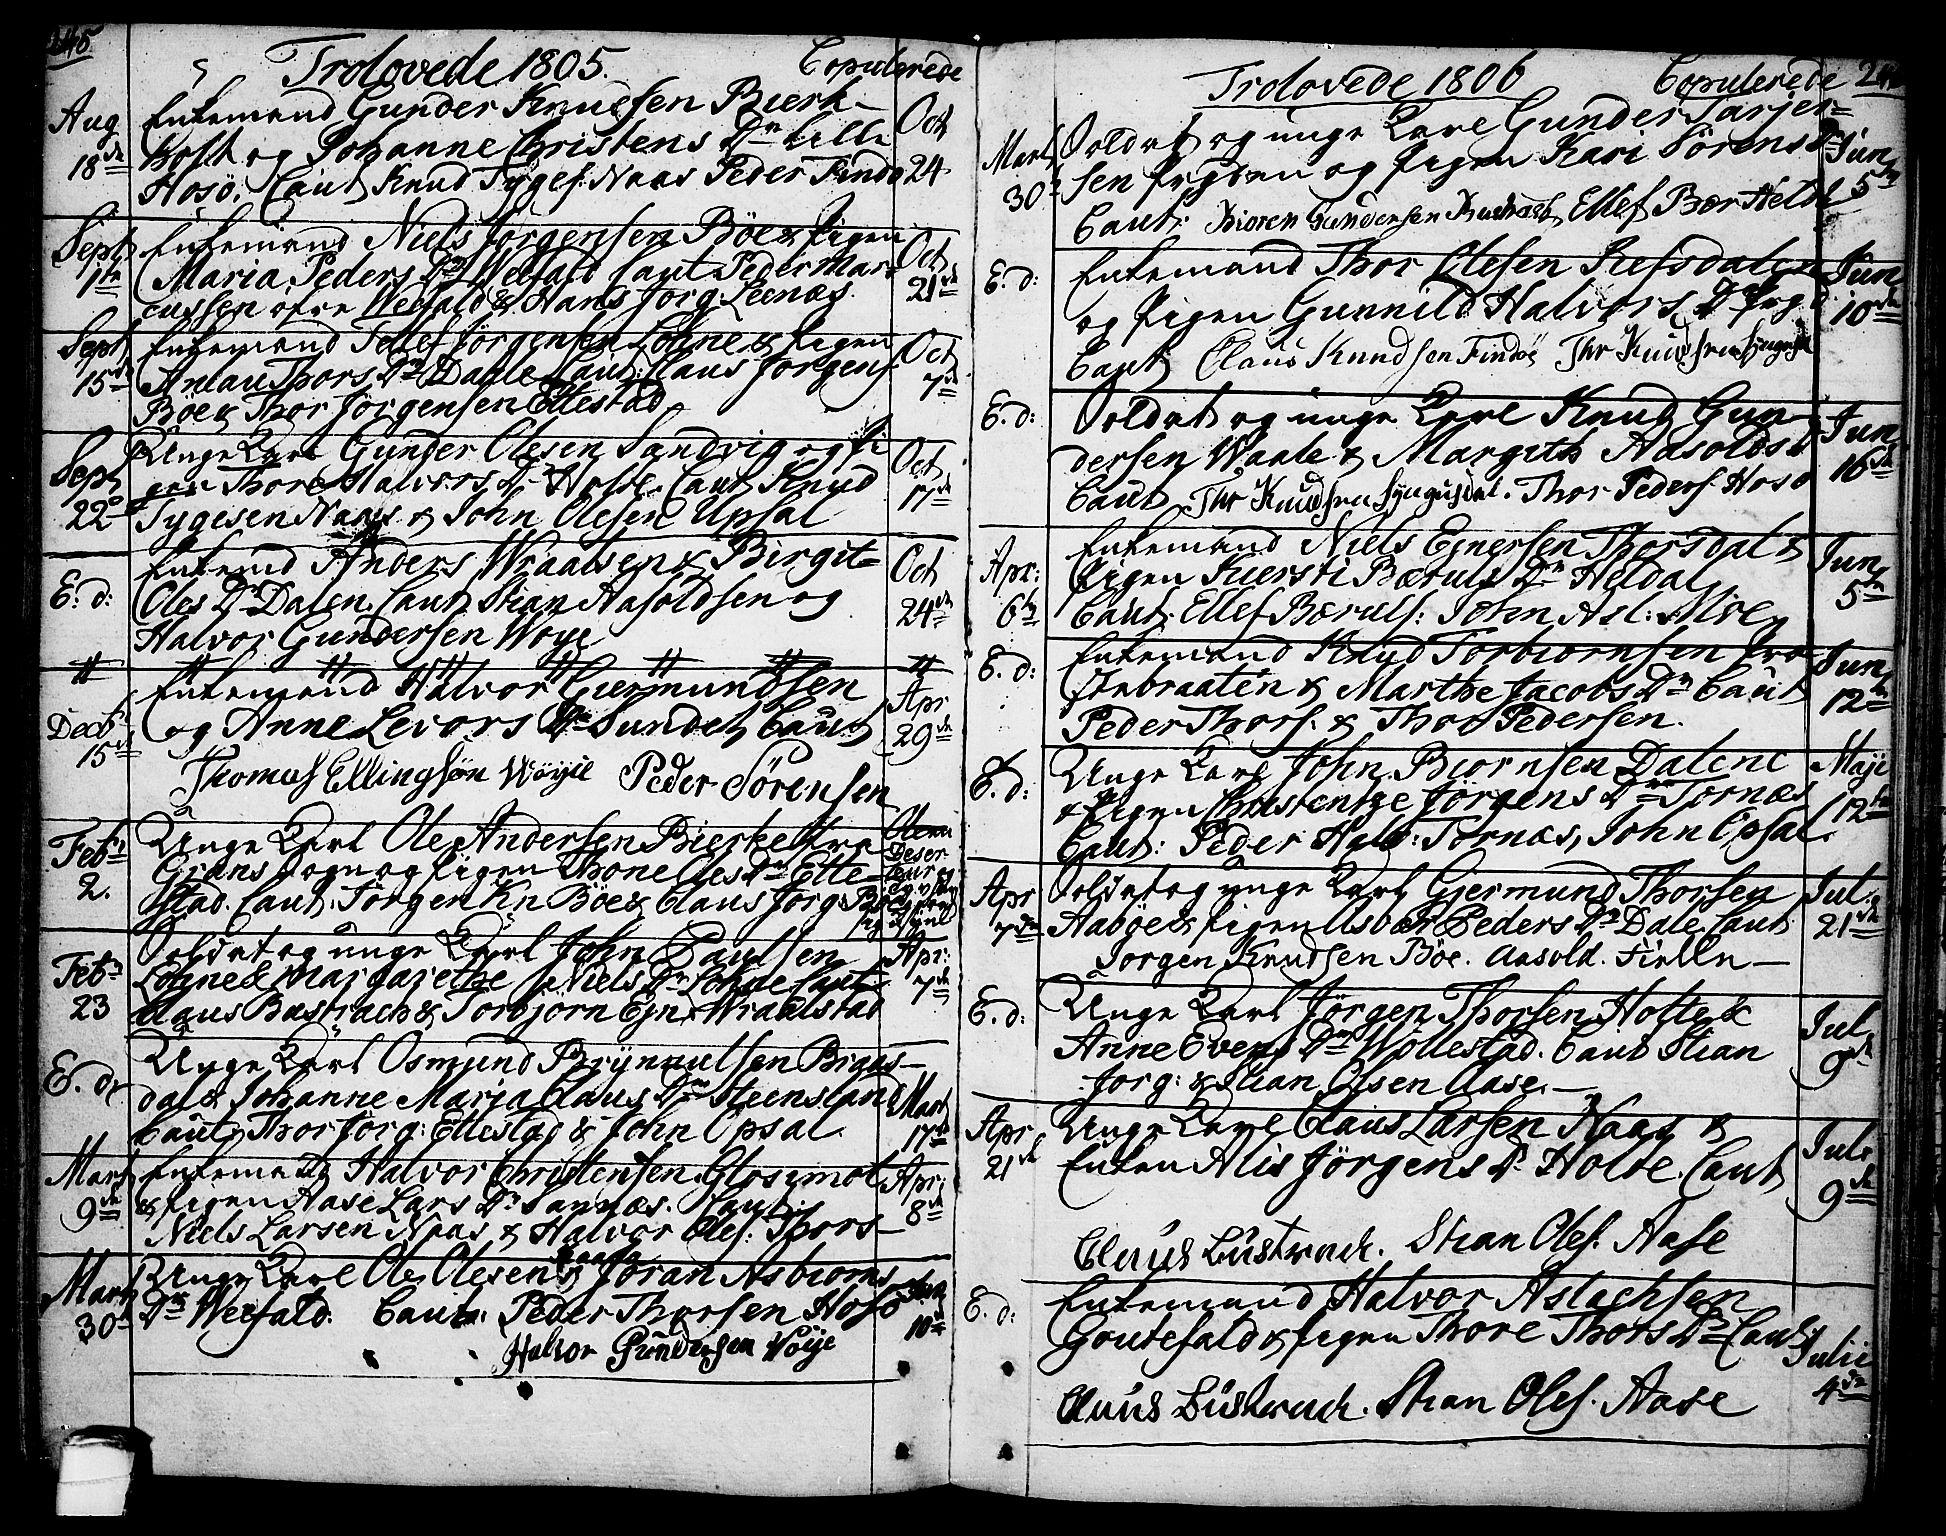 SAKO, Drangedal kirkebøker, F/Fa/L0003: Ministerialbok nr. 3, 1768-1814, s. 245-246